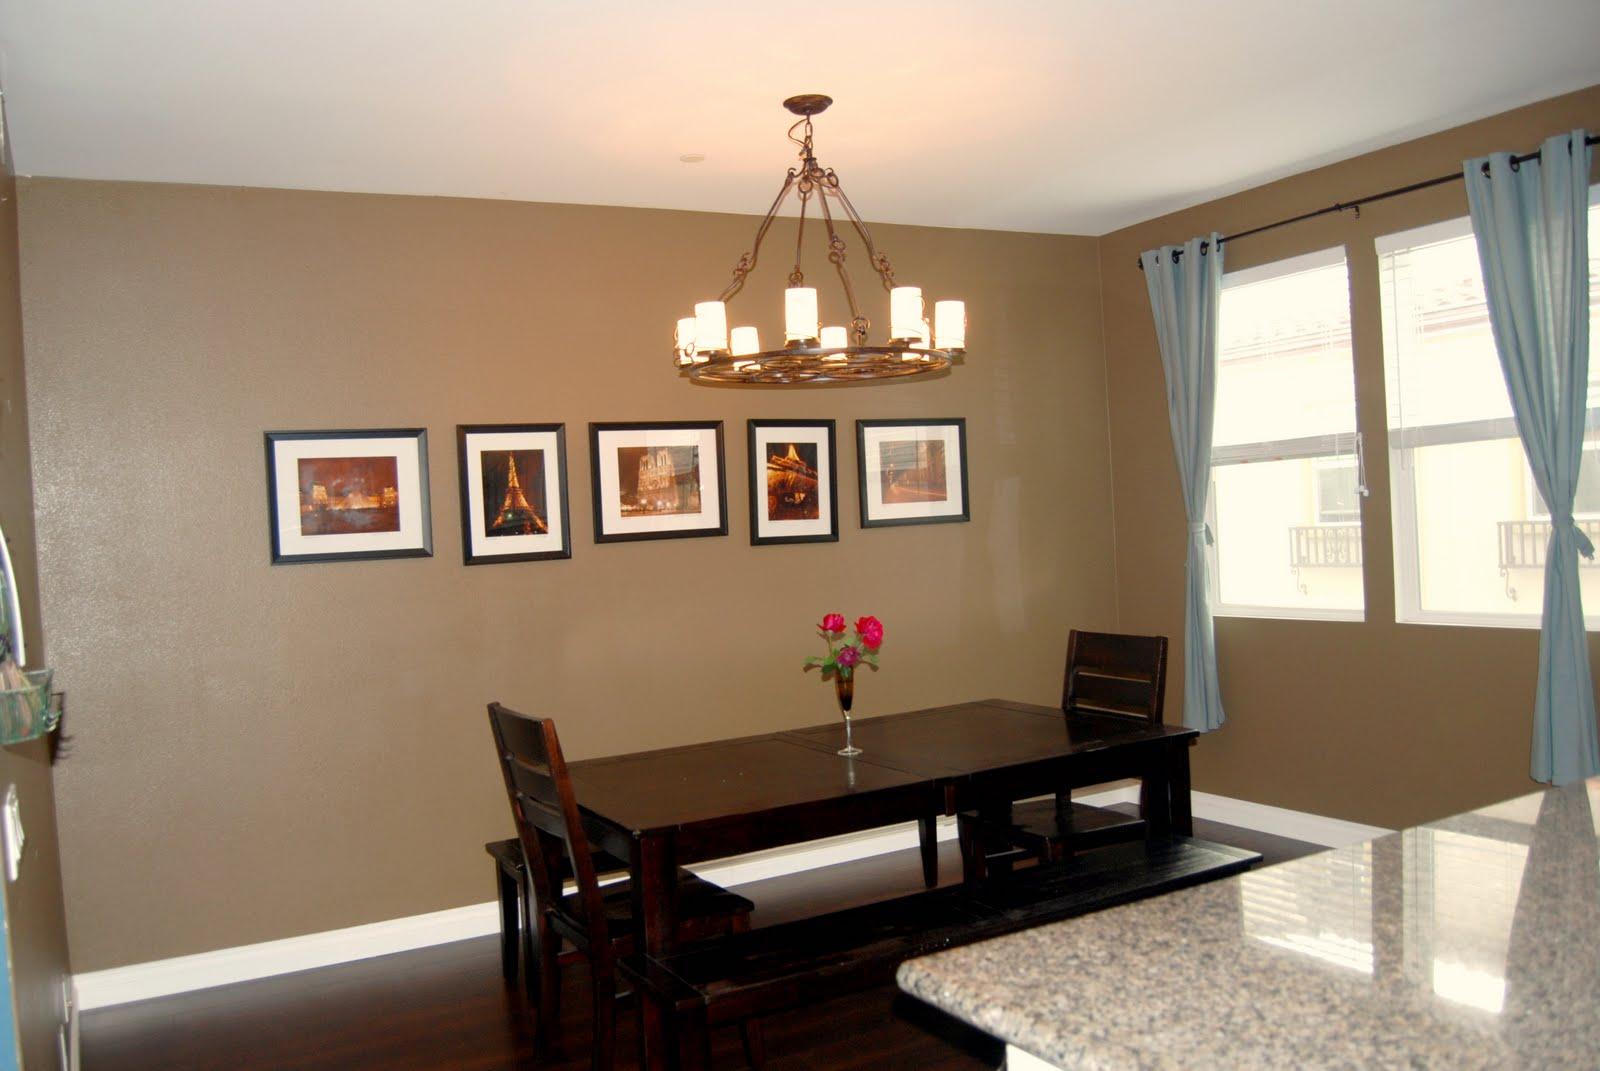 houzz dining room wall decor - create home